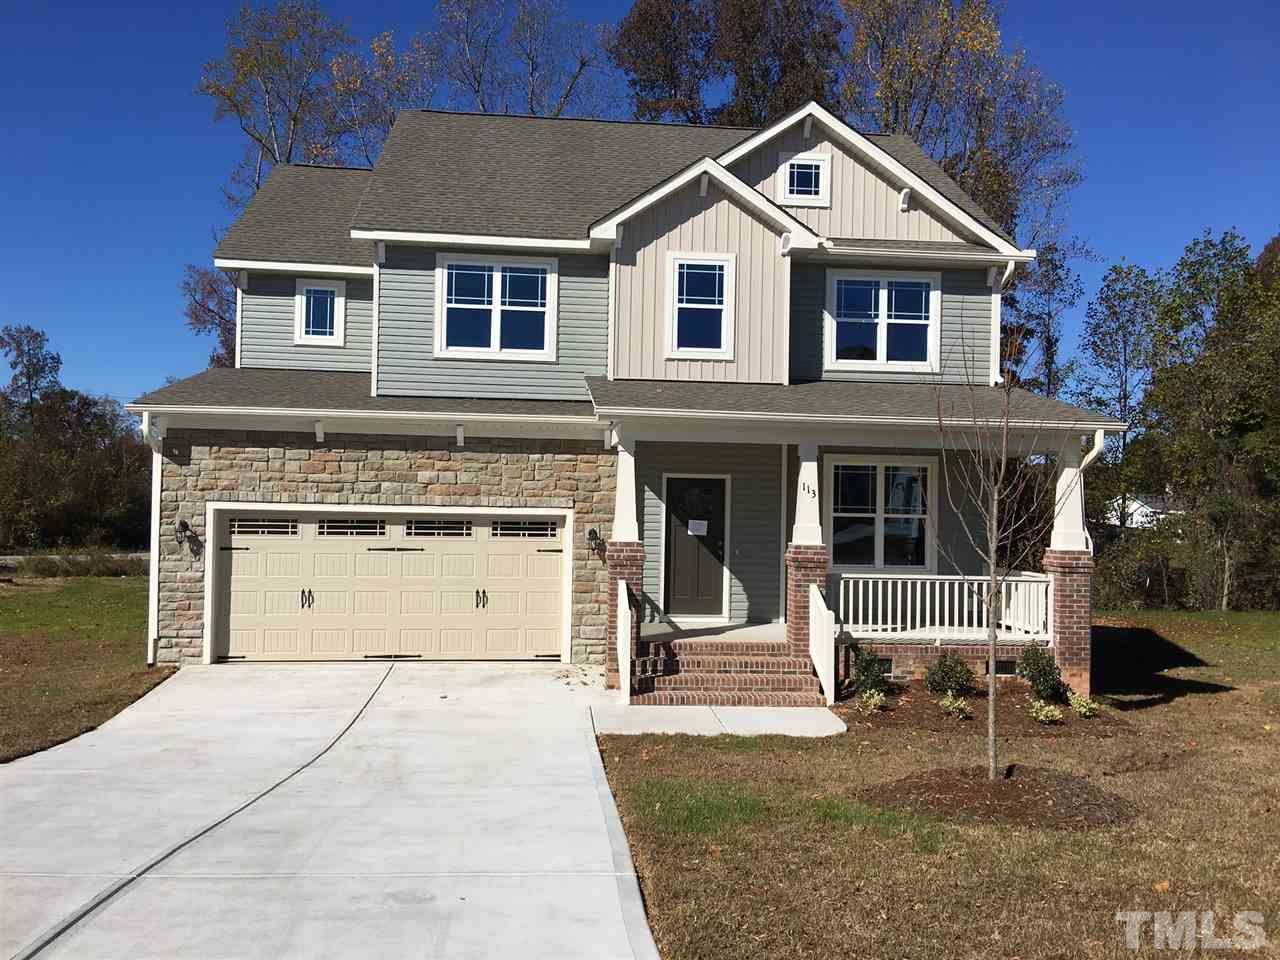 Photo of home for sale at 113 Thimble Way, Garner NC